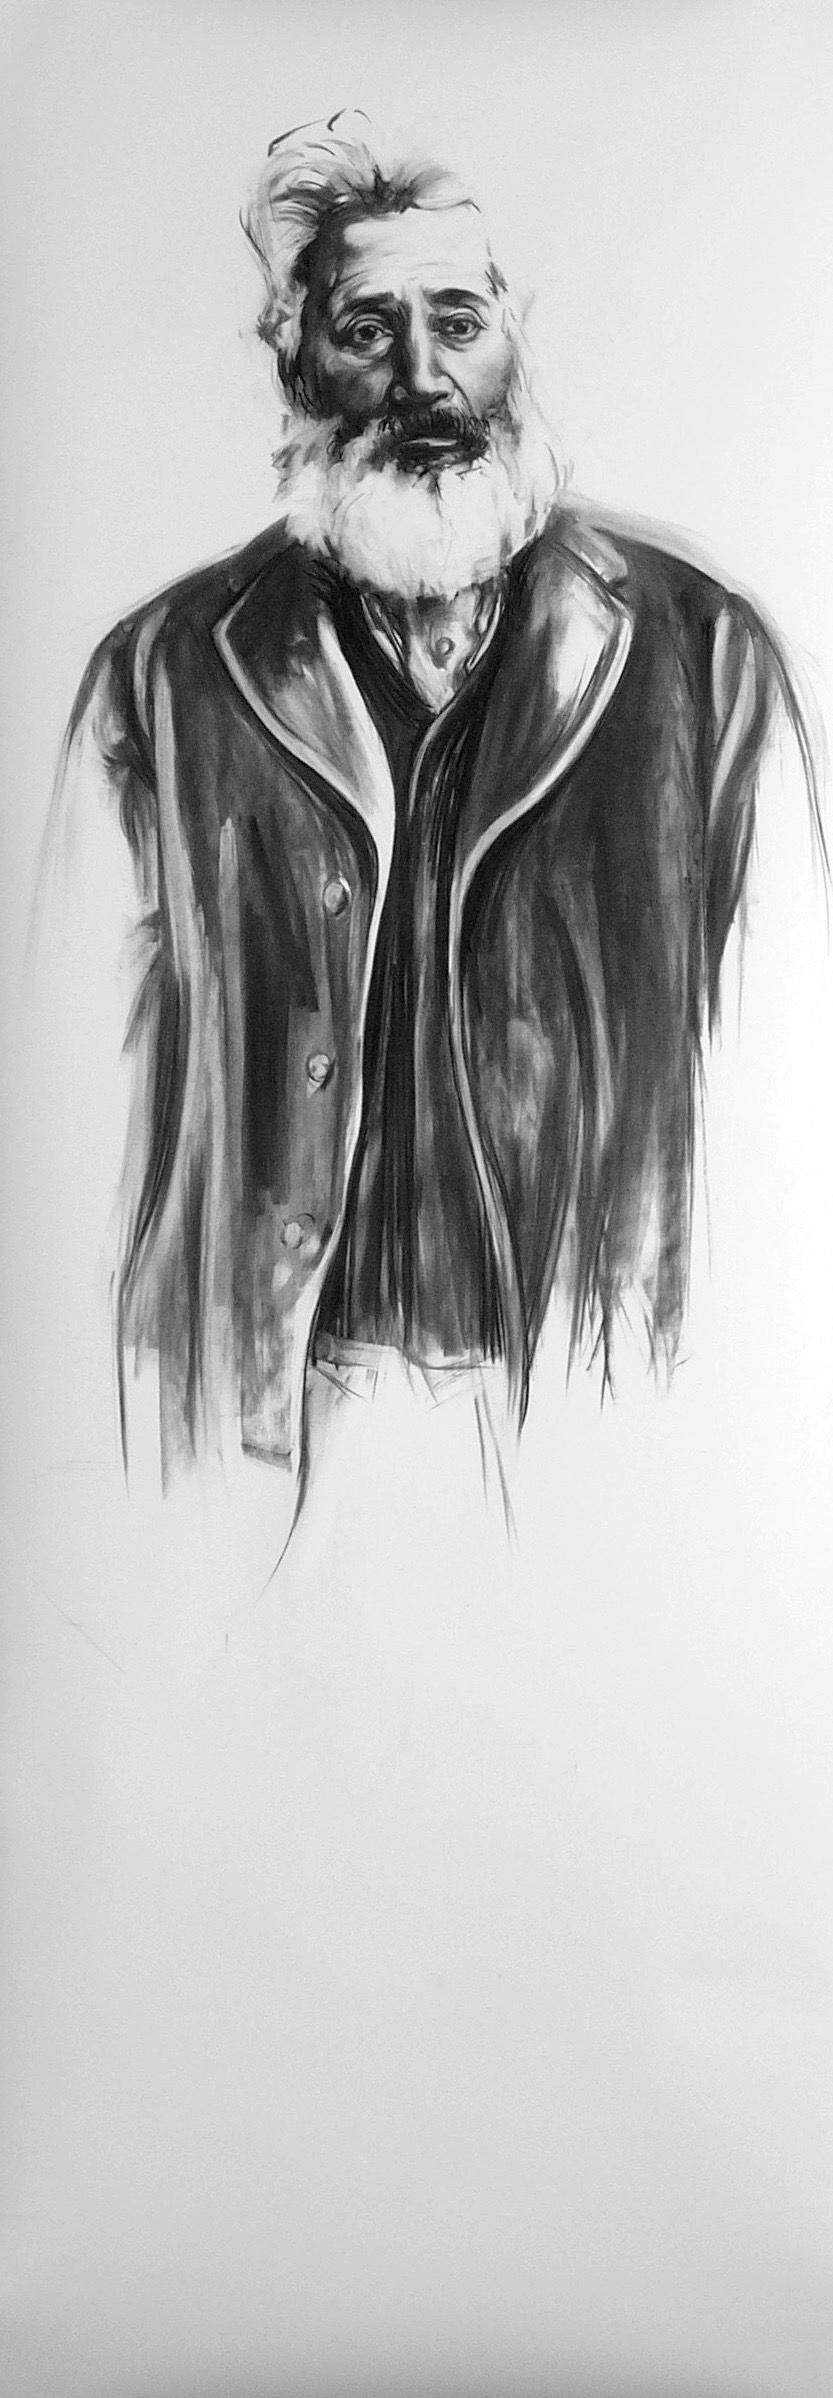 austin tann, 2005  Vine charcoal on paper  87 x 30 inches